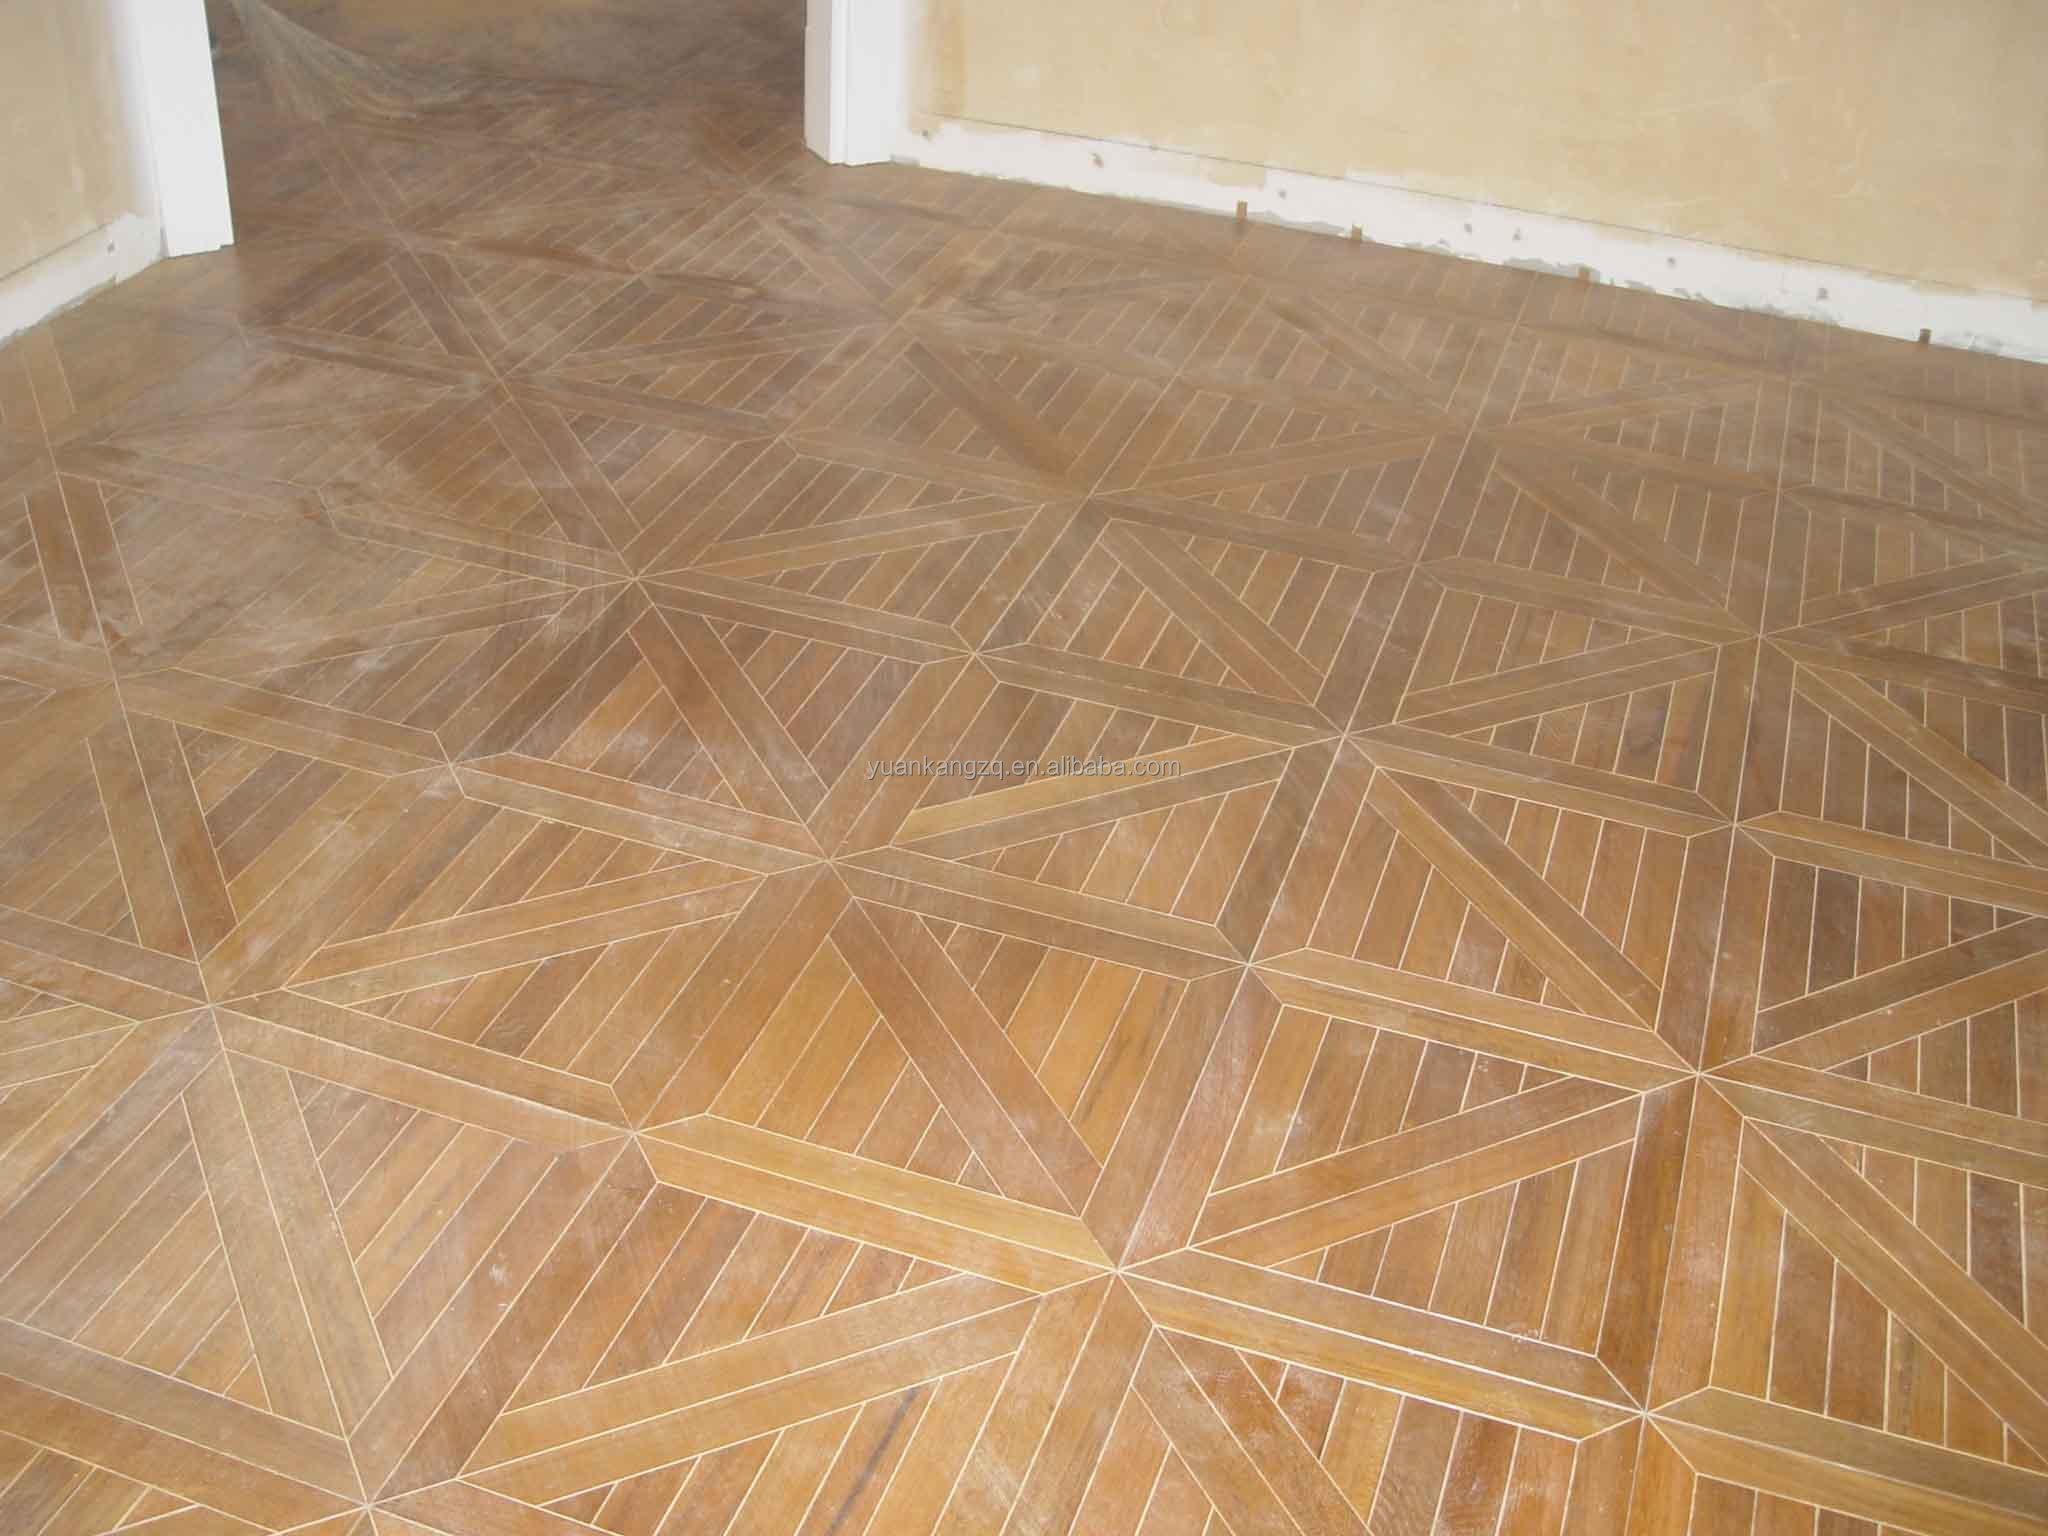 Mosaic laminate flooring mosaic laminate flooring suppliers and mosaic laminate flooring mosaic laminate flooring suppliers and manufacturers at alibaba doublecrazyfo Images